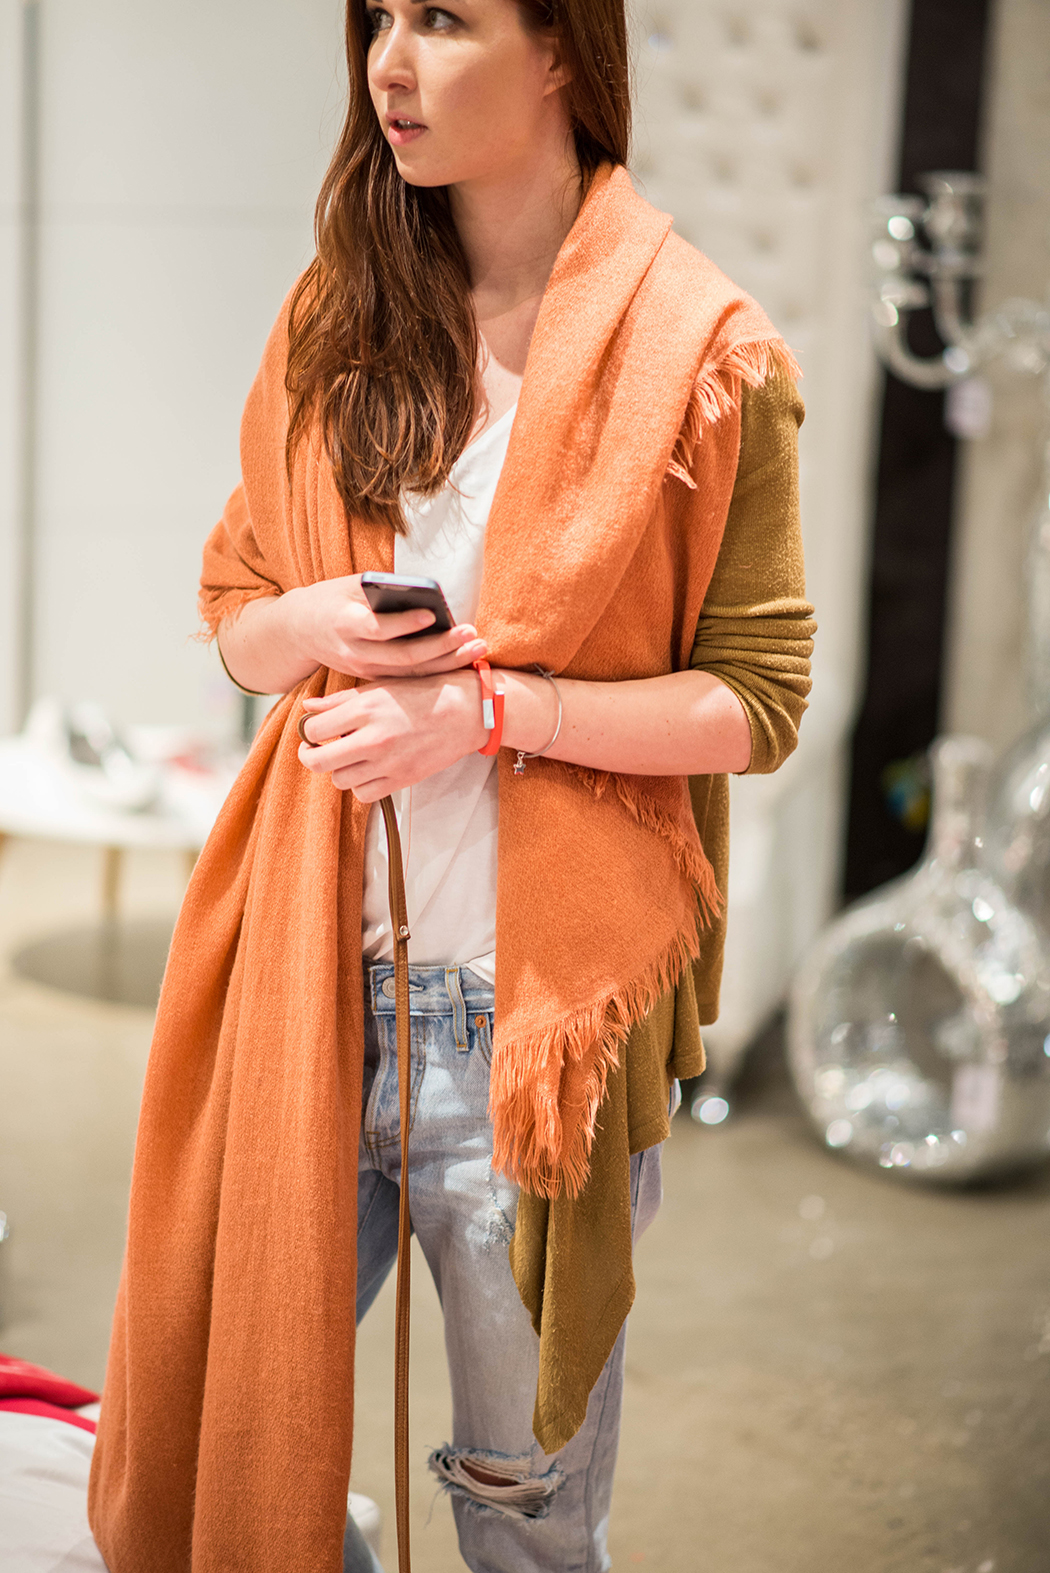 Jawbone-UP24-Produktbewertung-Testbericht-Schrittzähler-Fitnessarmband-Produktreview-Fashionblogger-Lindarella-München-Fashionblog-Fitnessblogger-Fitnessblog-25